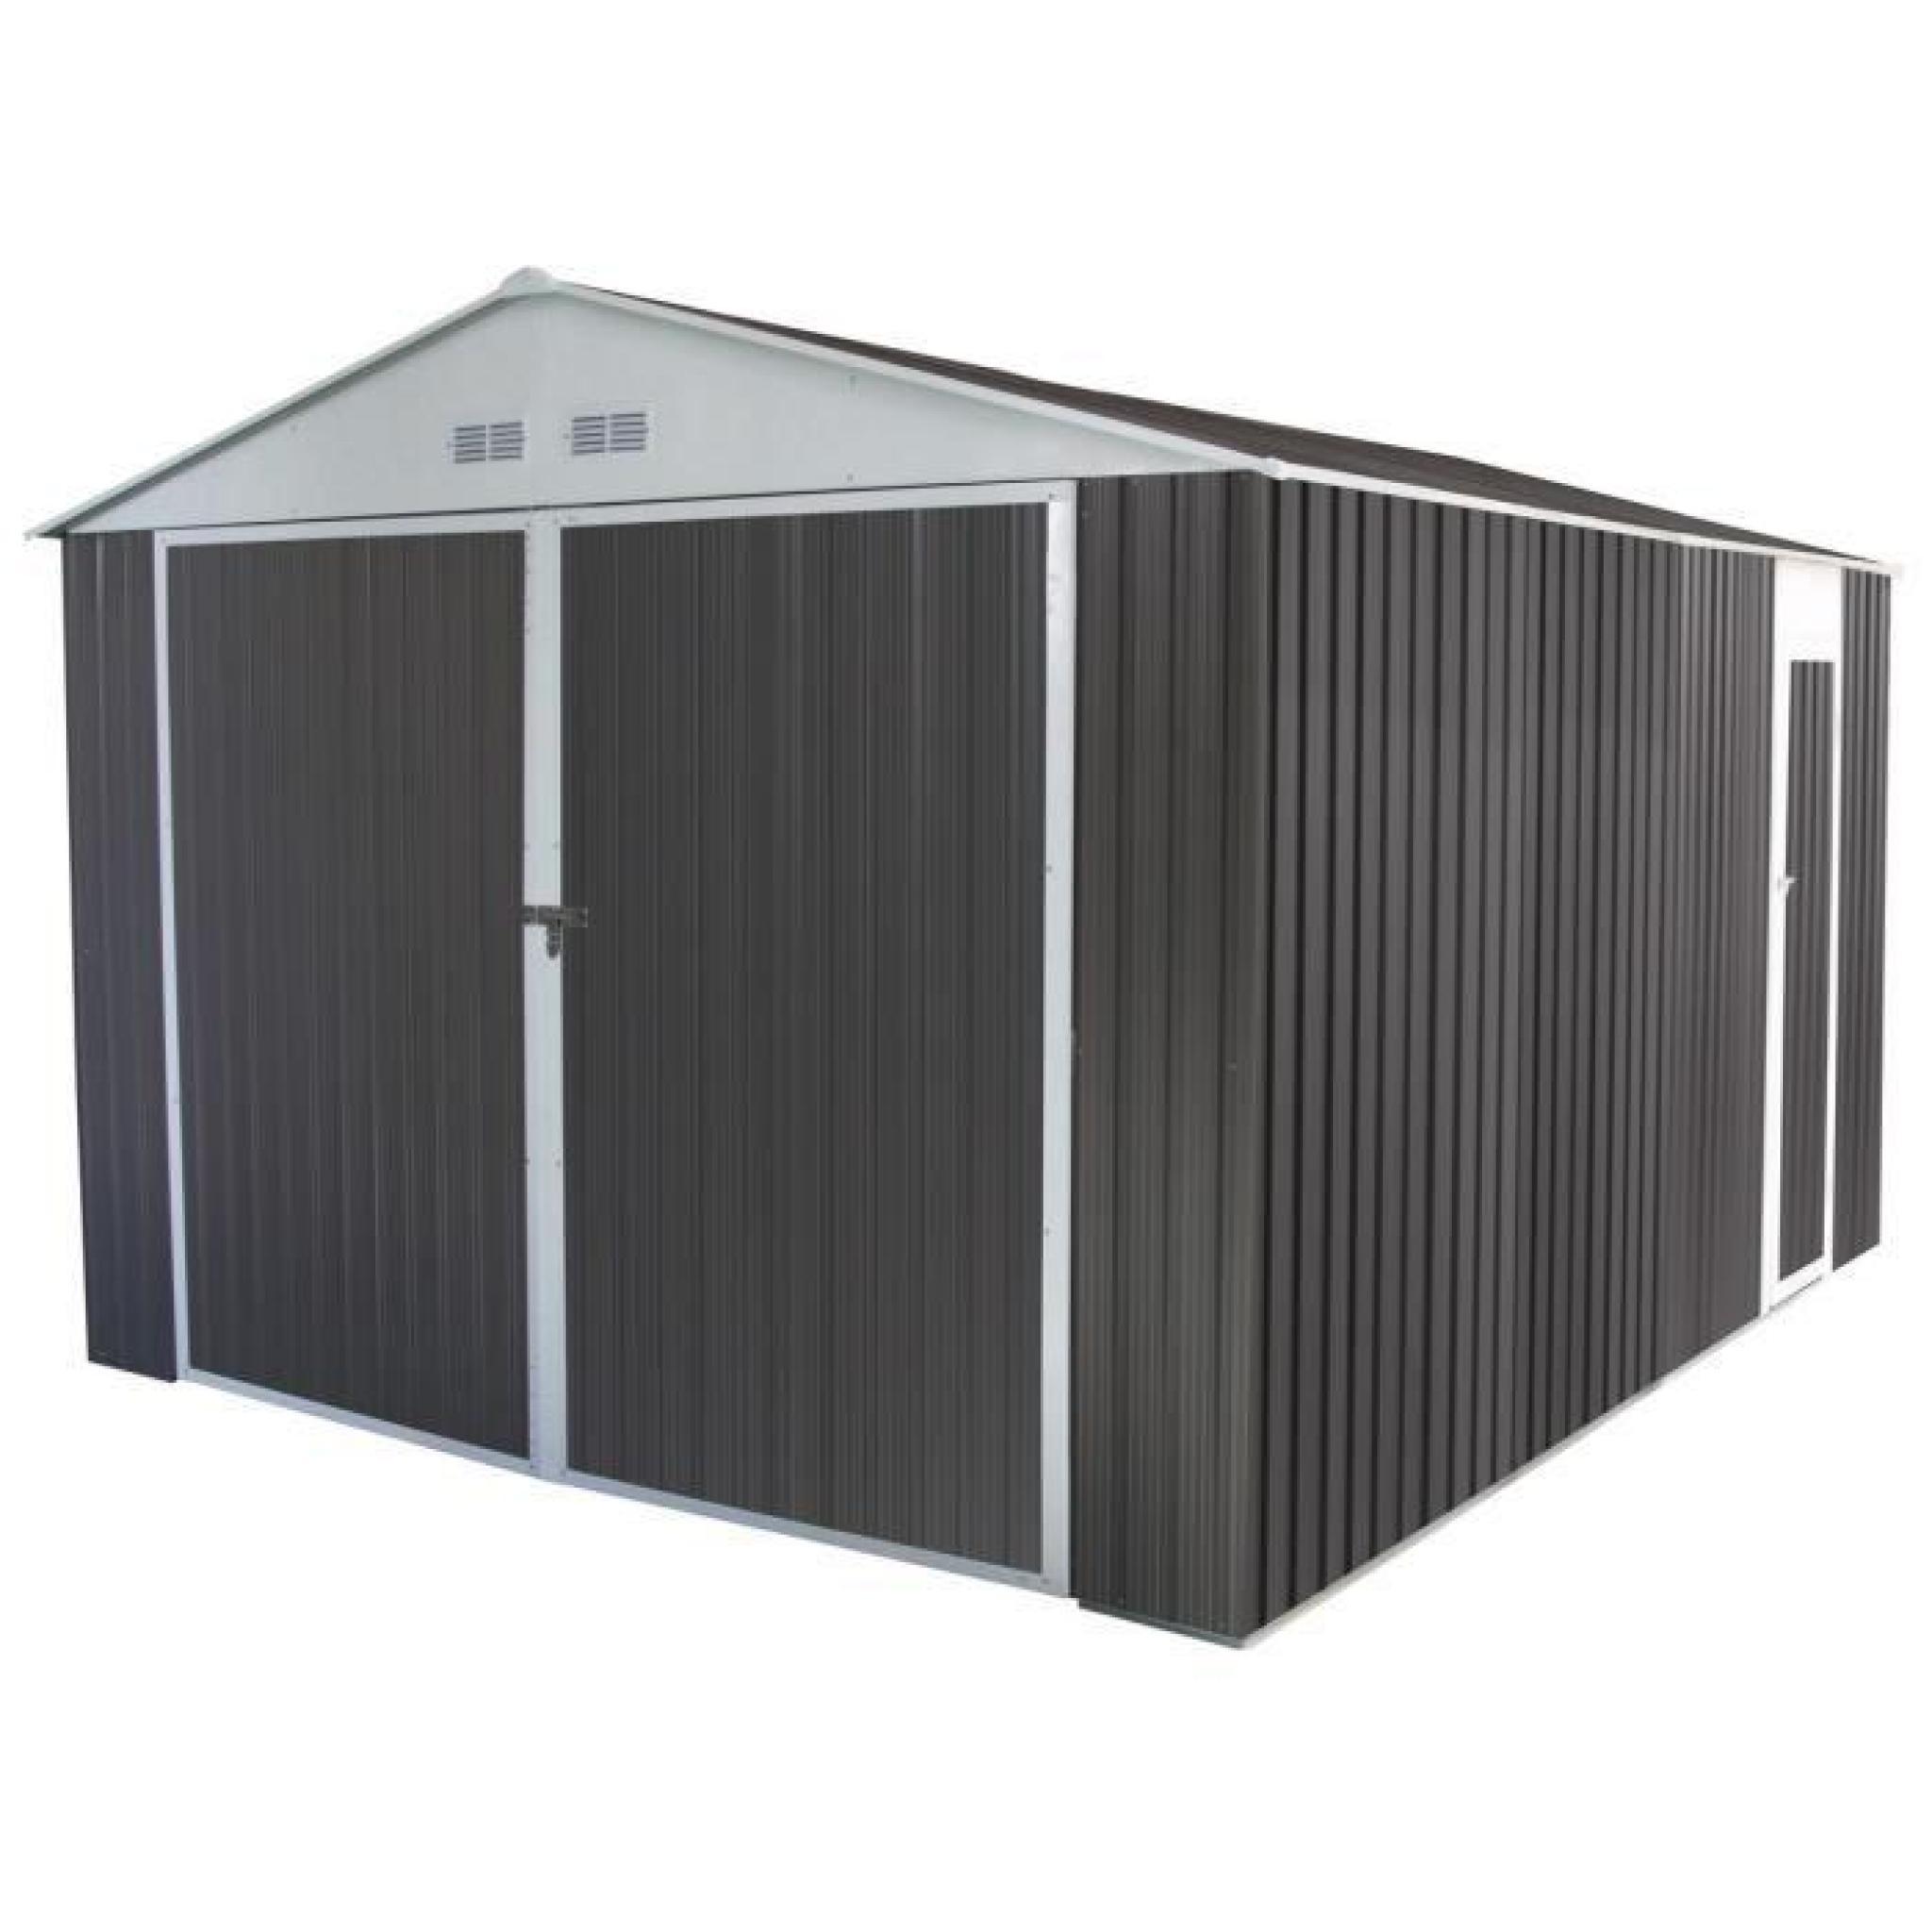 Garage Metal Nevada Avec Porte Battante 15 36 M Achat Vente Garage En Metal Pas Cher Coindujardin Com